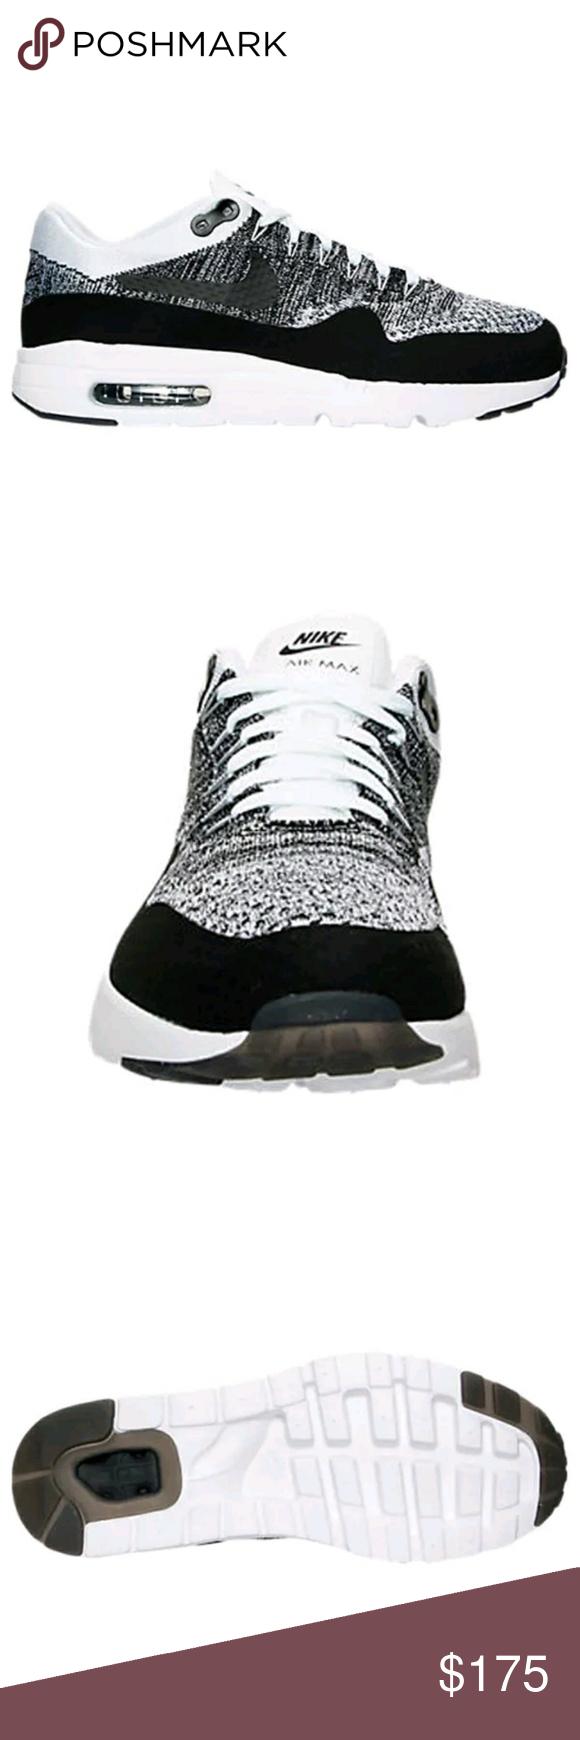 Nike Air Max 1 Ultra Flyknit 843384 100 OREO 11.5 Nike Air